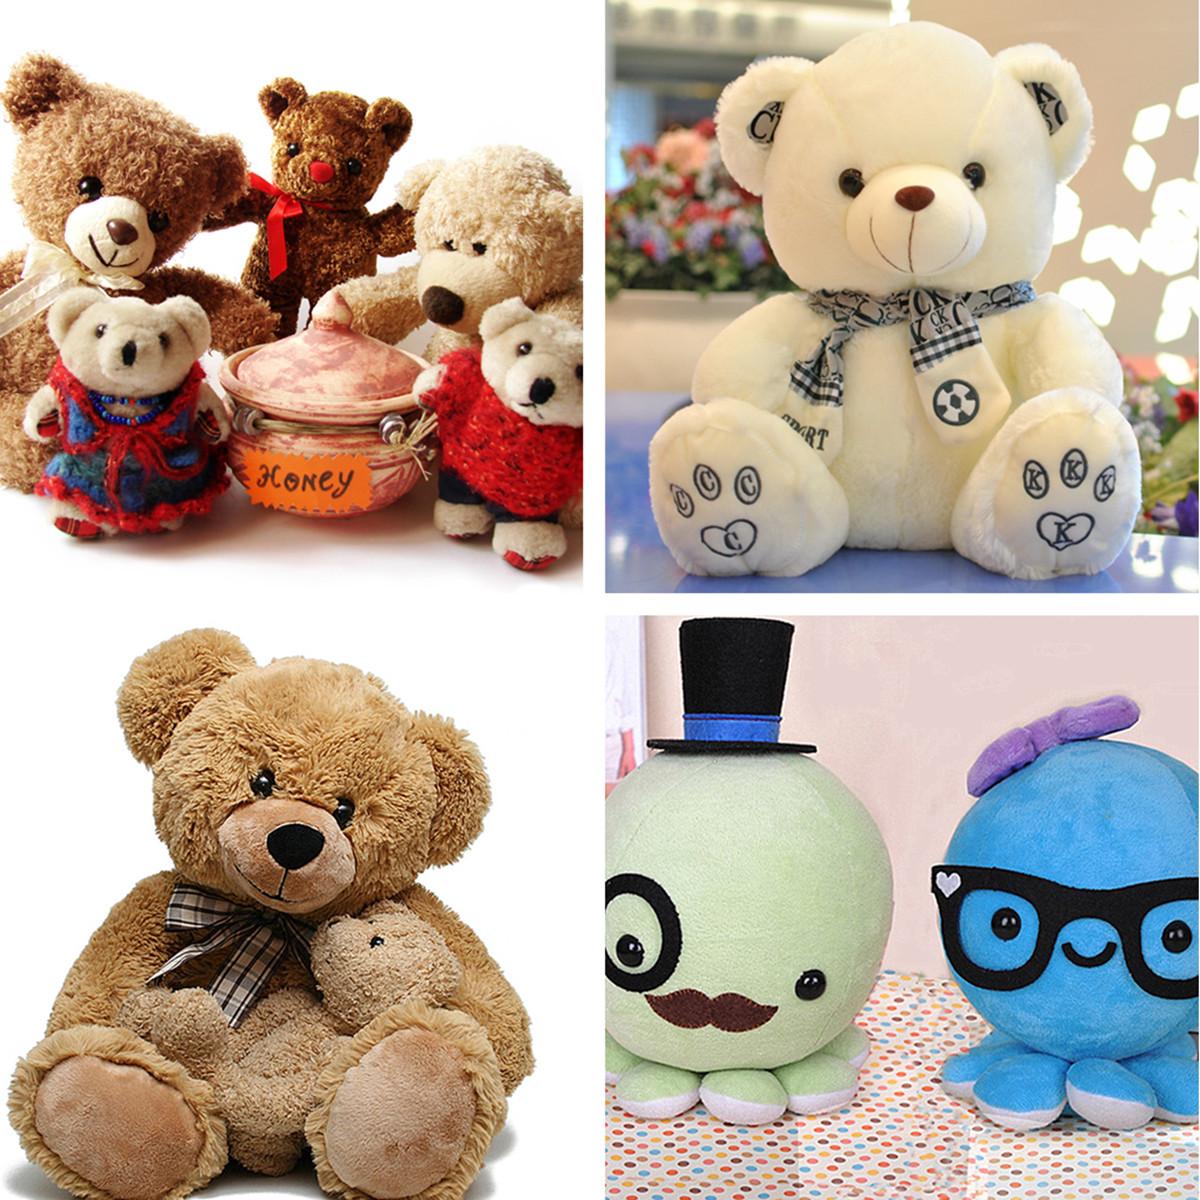 100x 12mm Plastic Safety Eyes For Soft Toys Teddy Bear Doll Making DIY Black